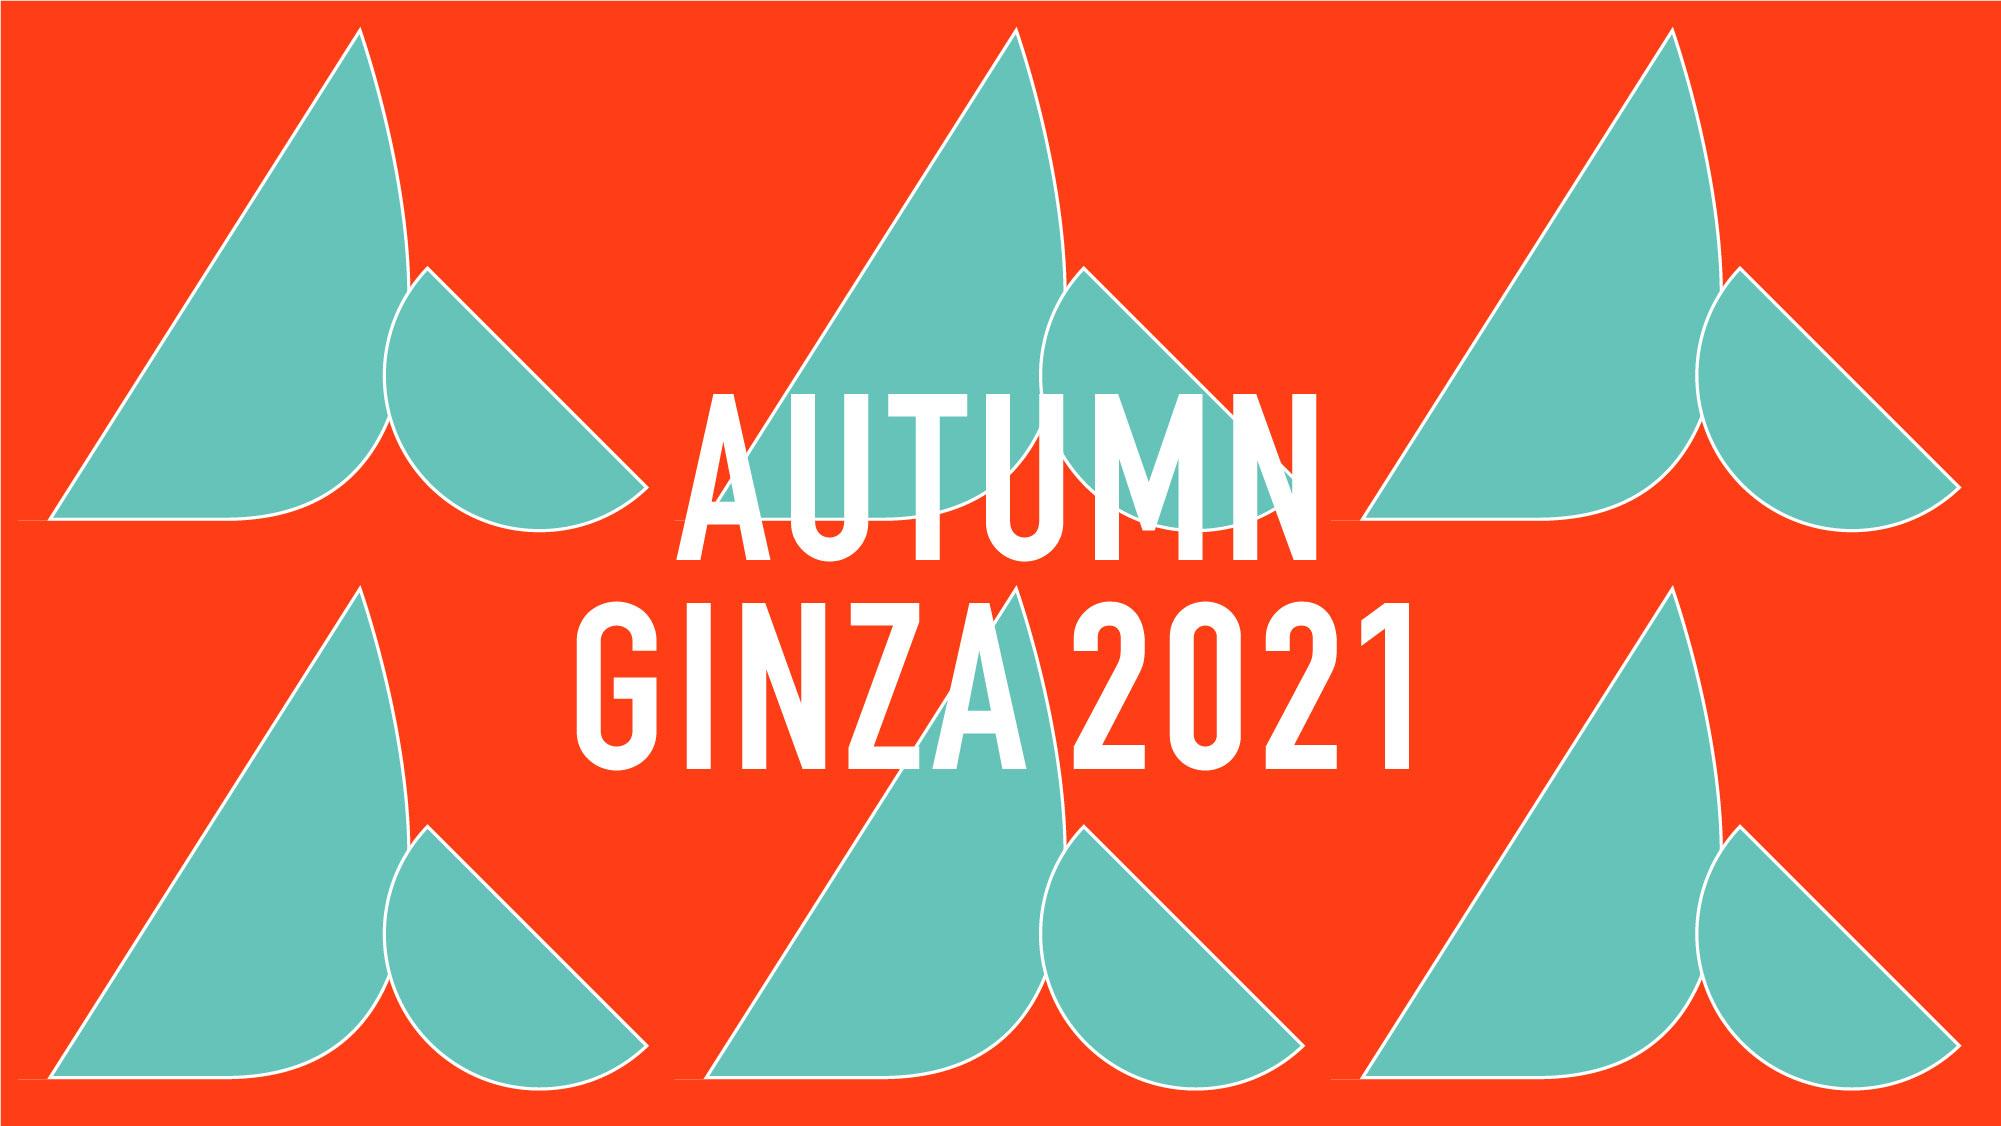 AUTUMN GINZA 2021